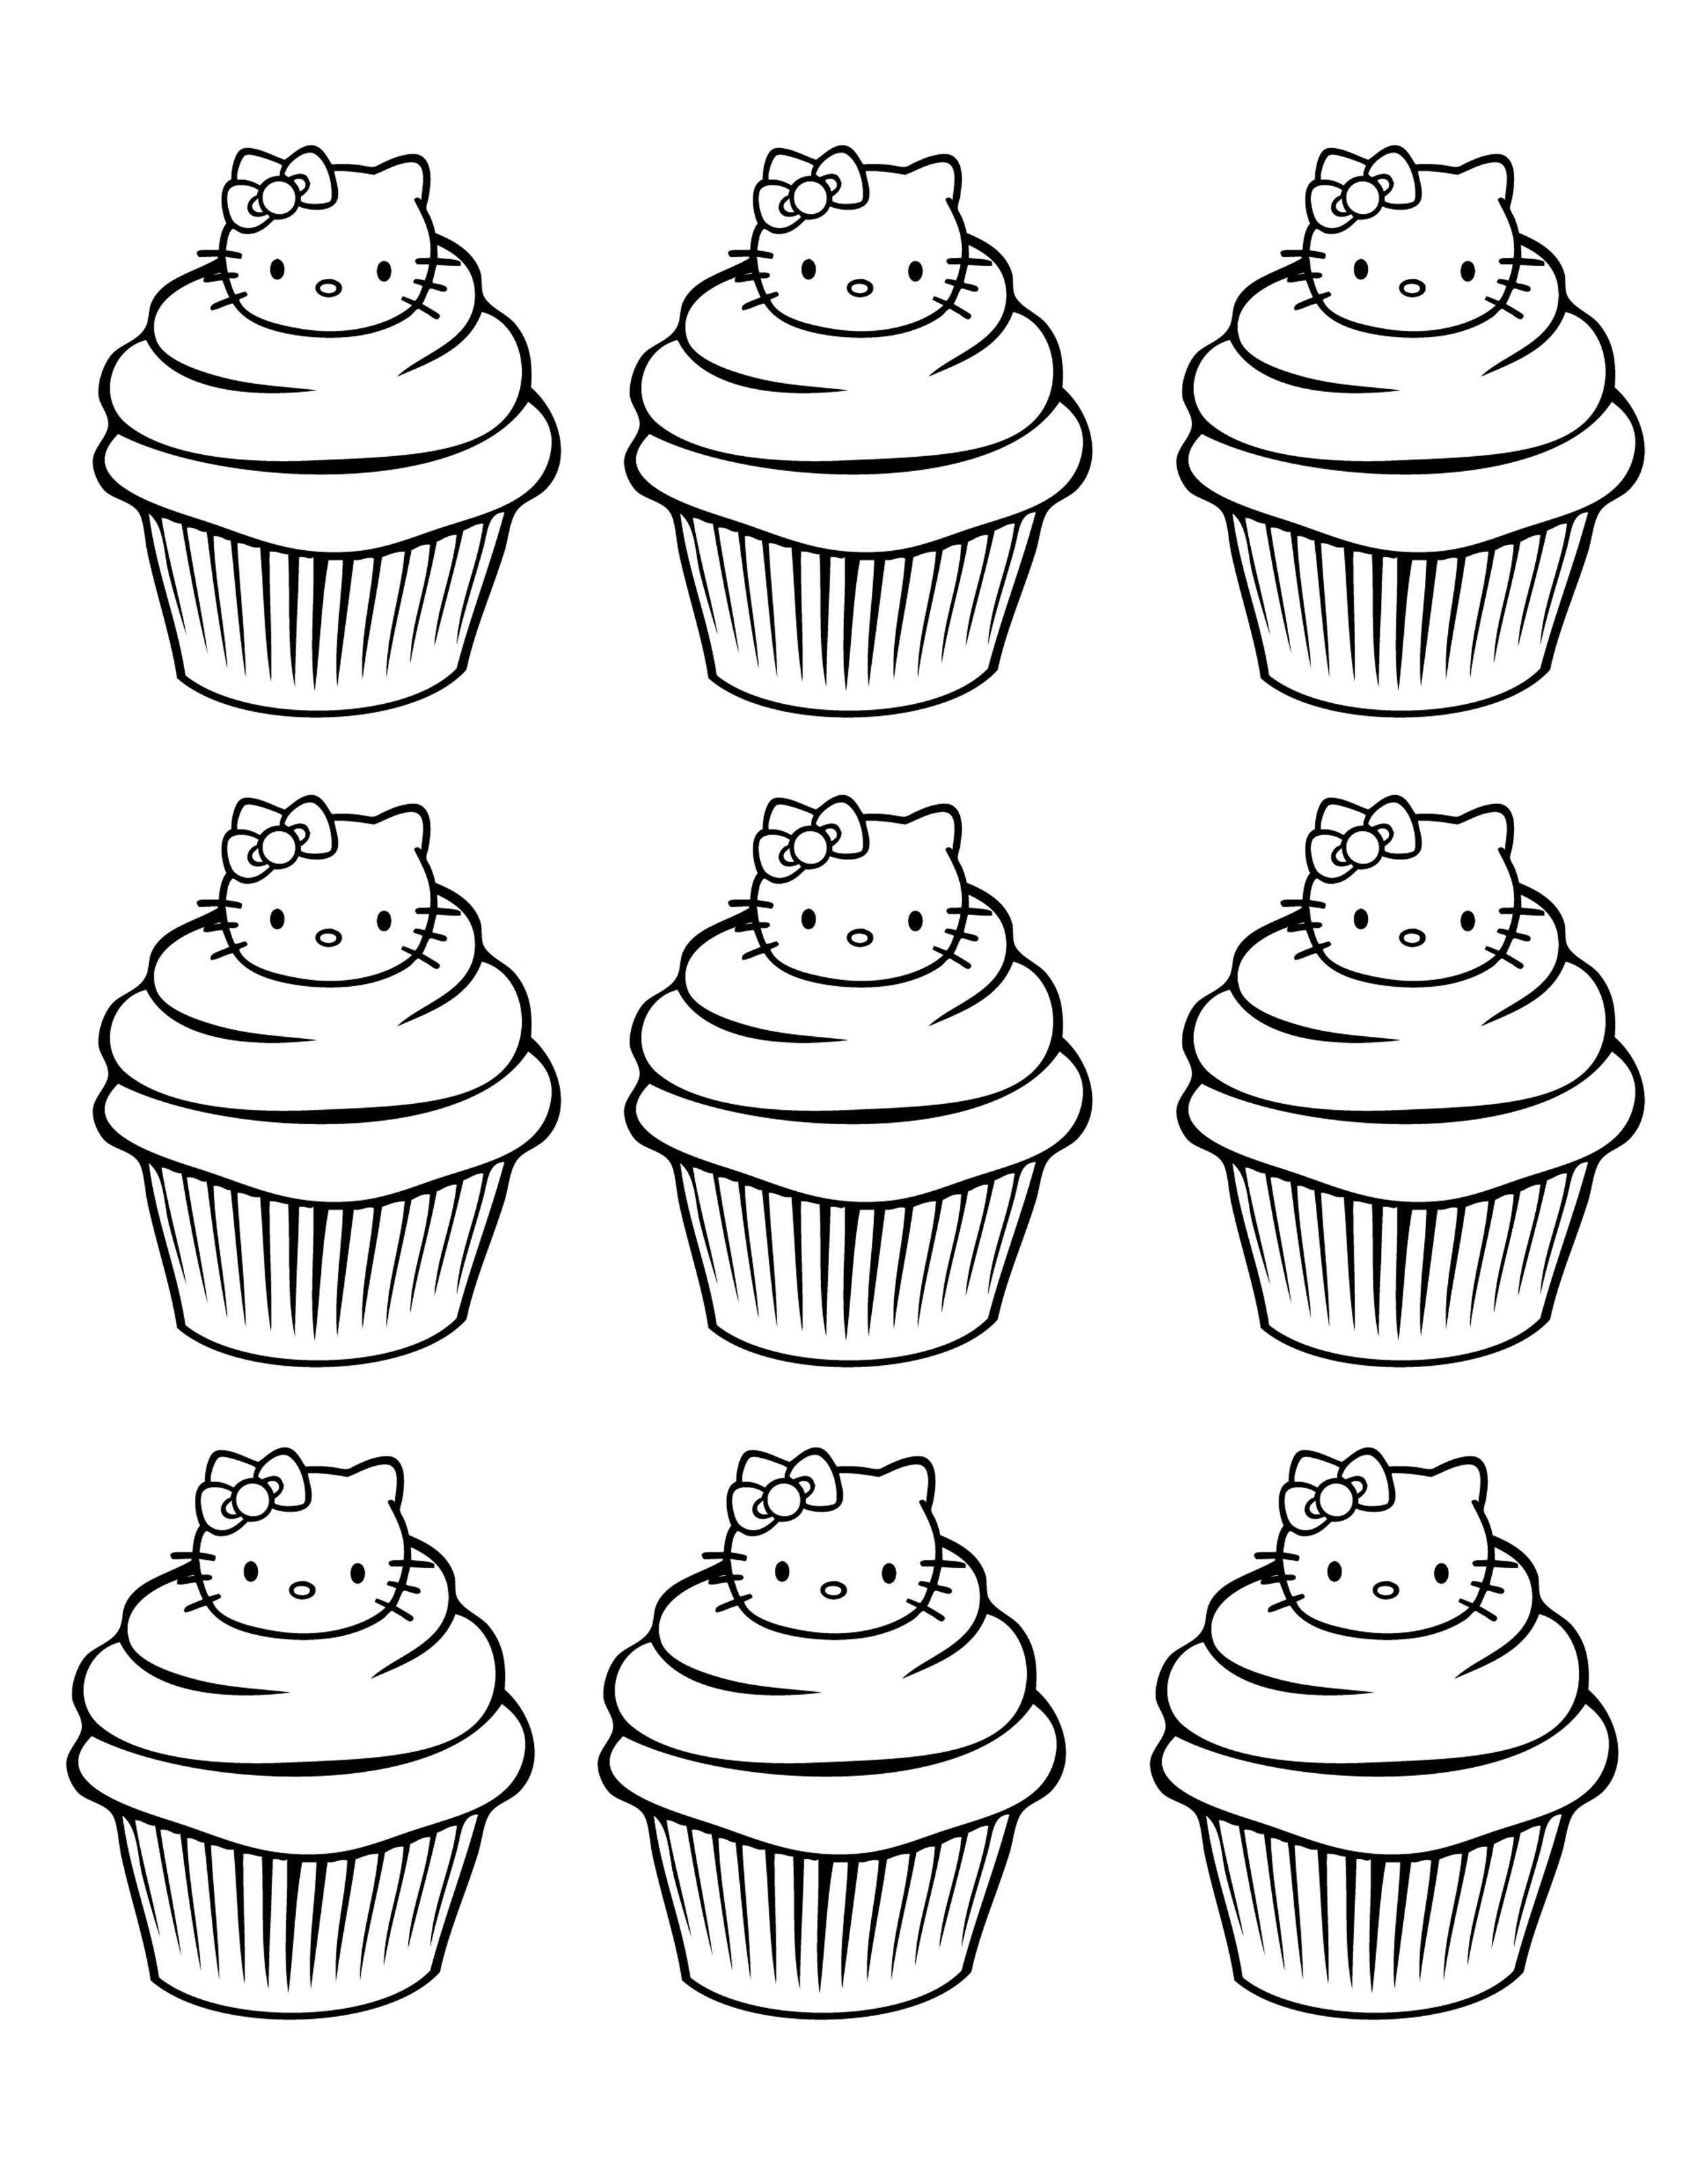 Coloriage Ingredients Gateau.Coloriage Cupcake Coloriage Kawaii Nourriture 15 Dessins Imprimer